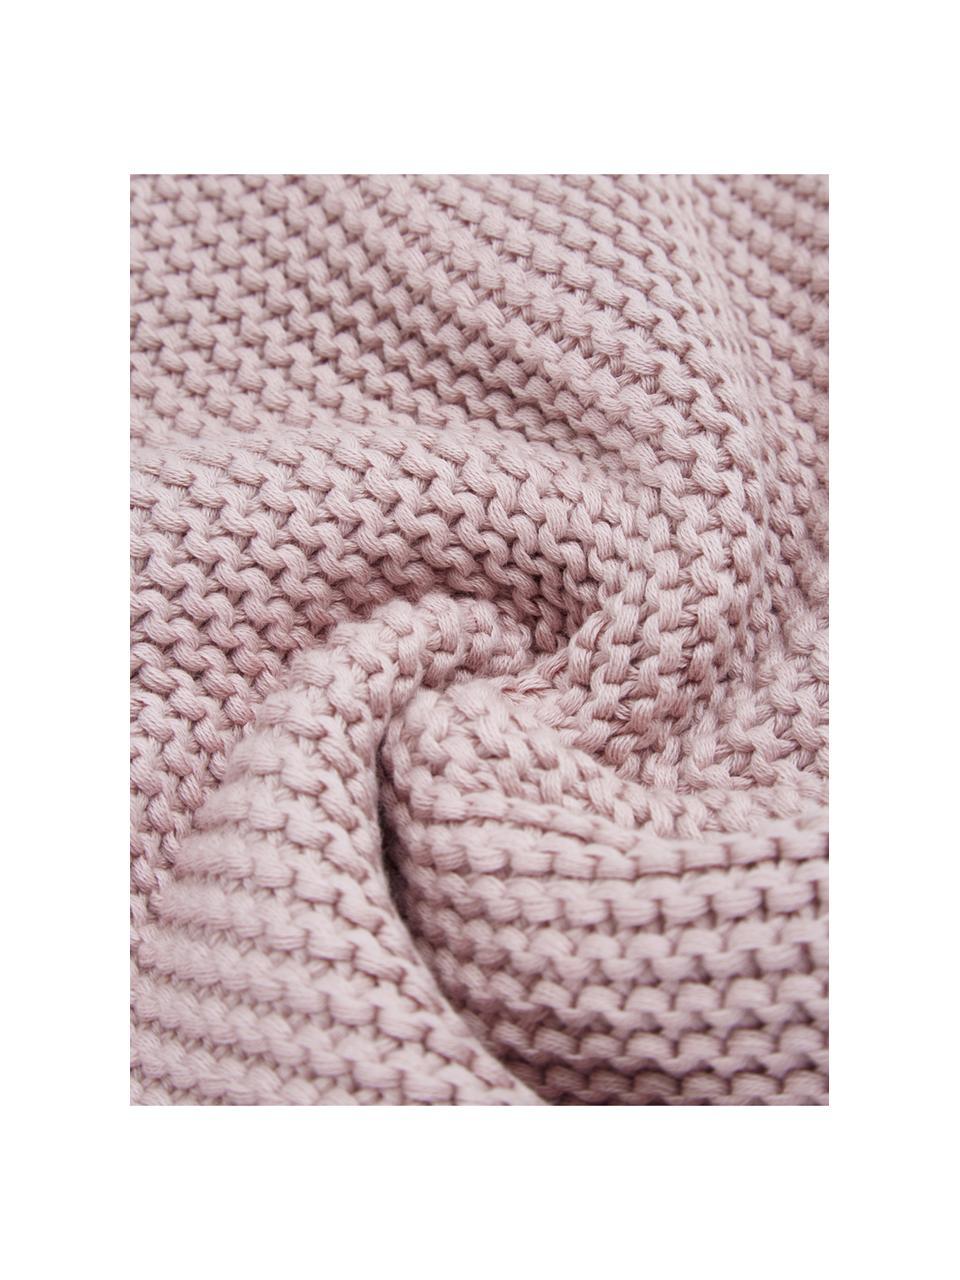 Strick-Kissenhülle Adalyn aus Bio-Baumwolle in Altrosa, 100% Bio-Baumwolle, GOTS-zertifiziert, Rosa, 30 x 50 cm